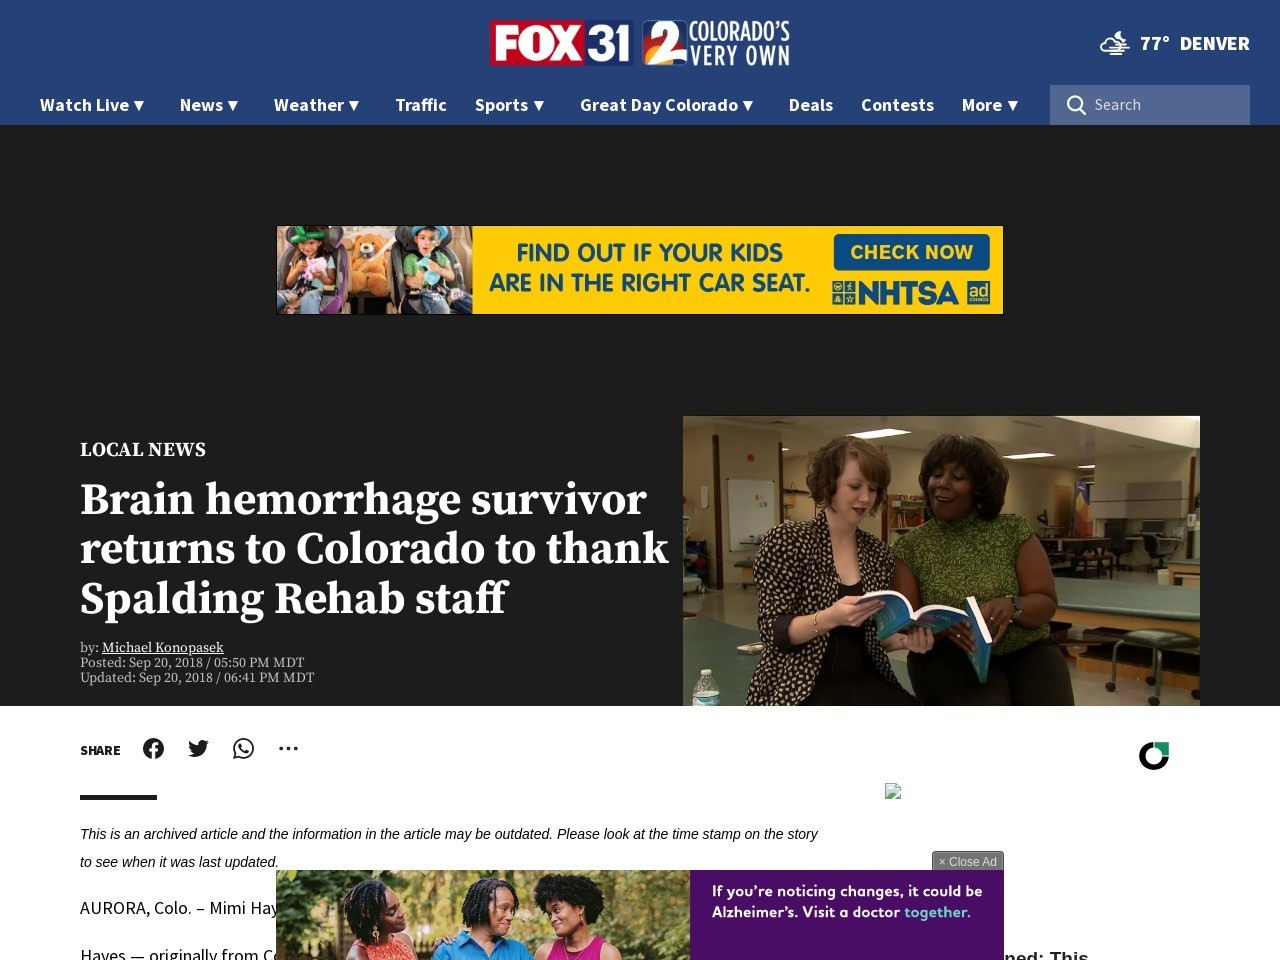 Brain hemorrhage survivor returns to Colorado to thank Spalding Rehab staff